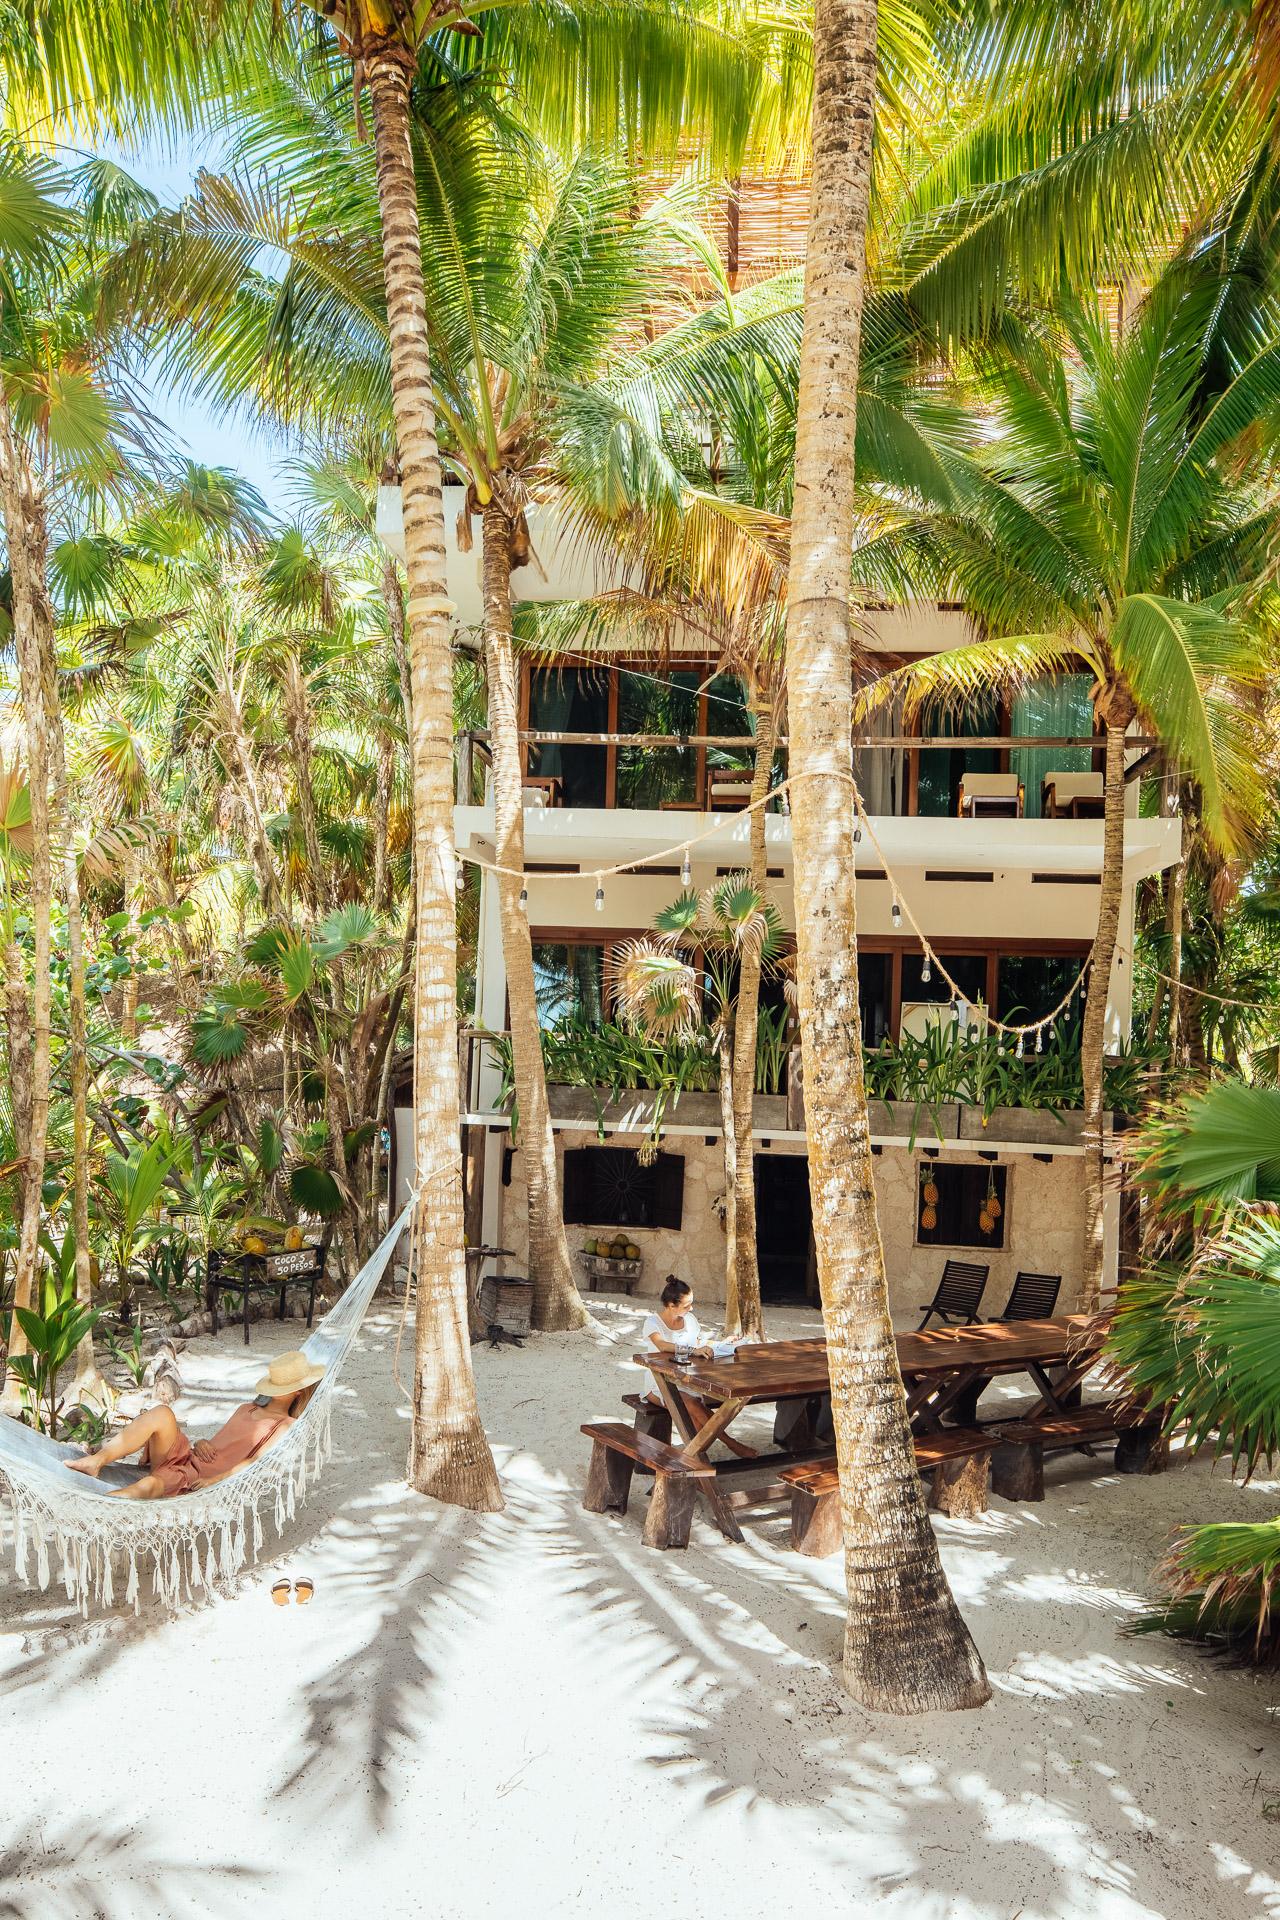 caribbean-hotel-resort-photographer-olas-tulum-mexico--6.jpg